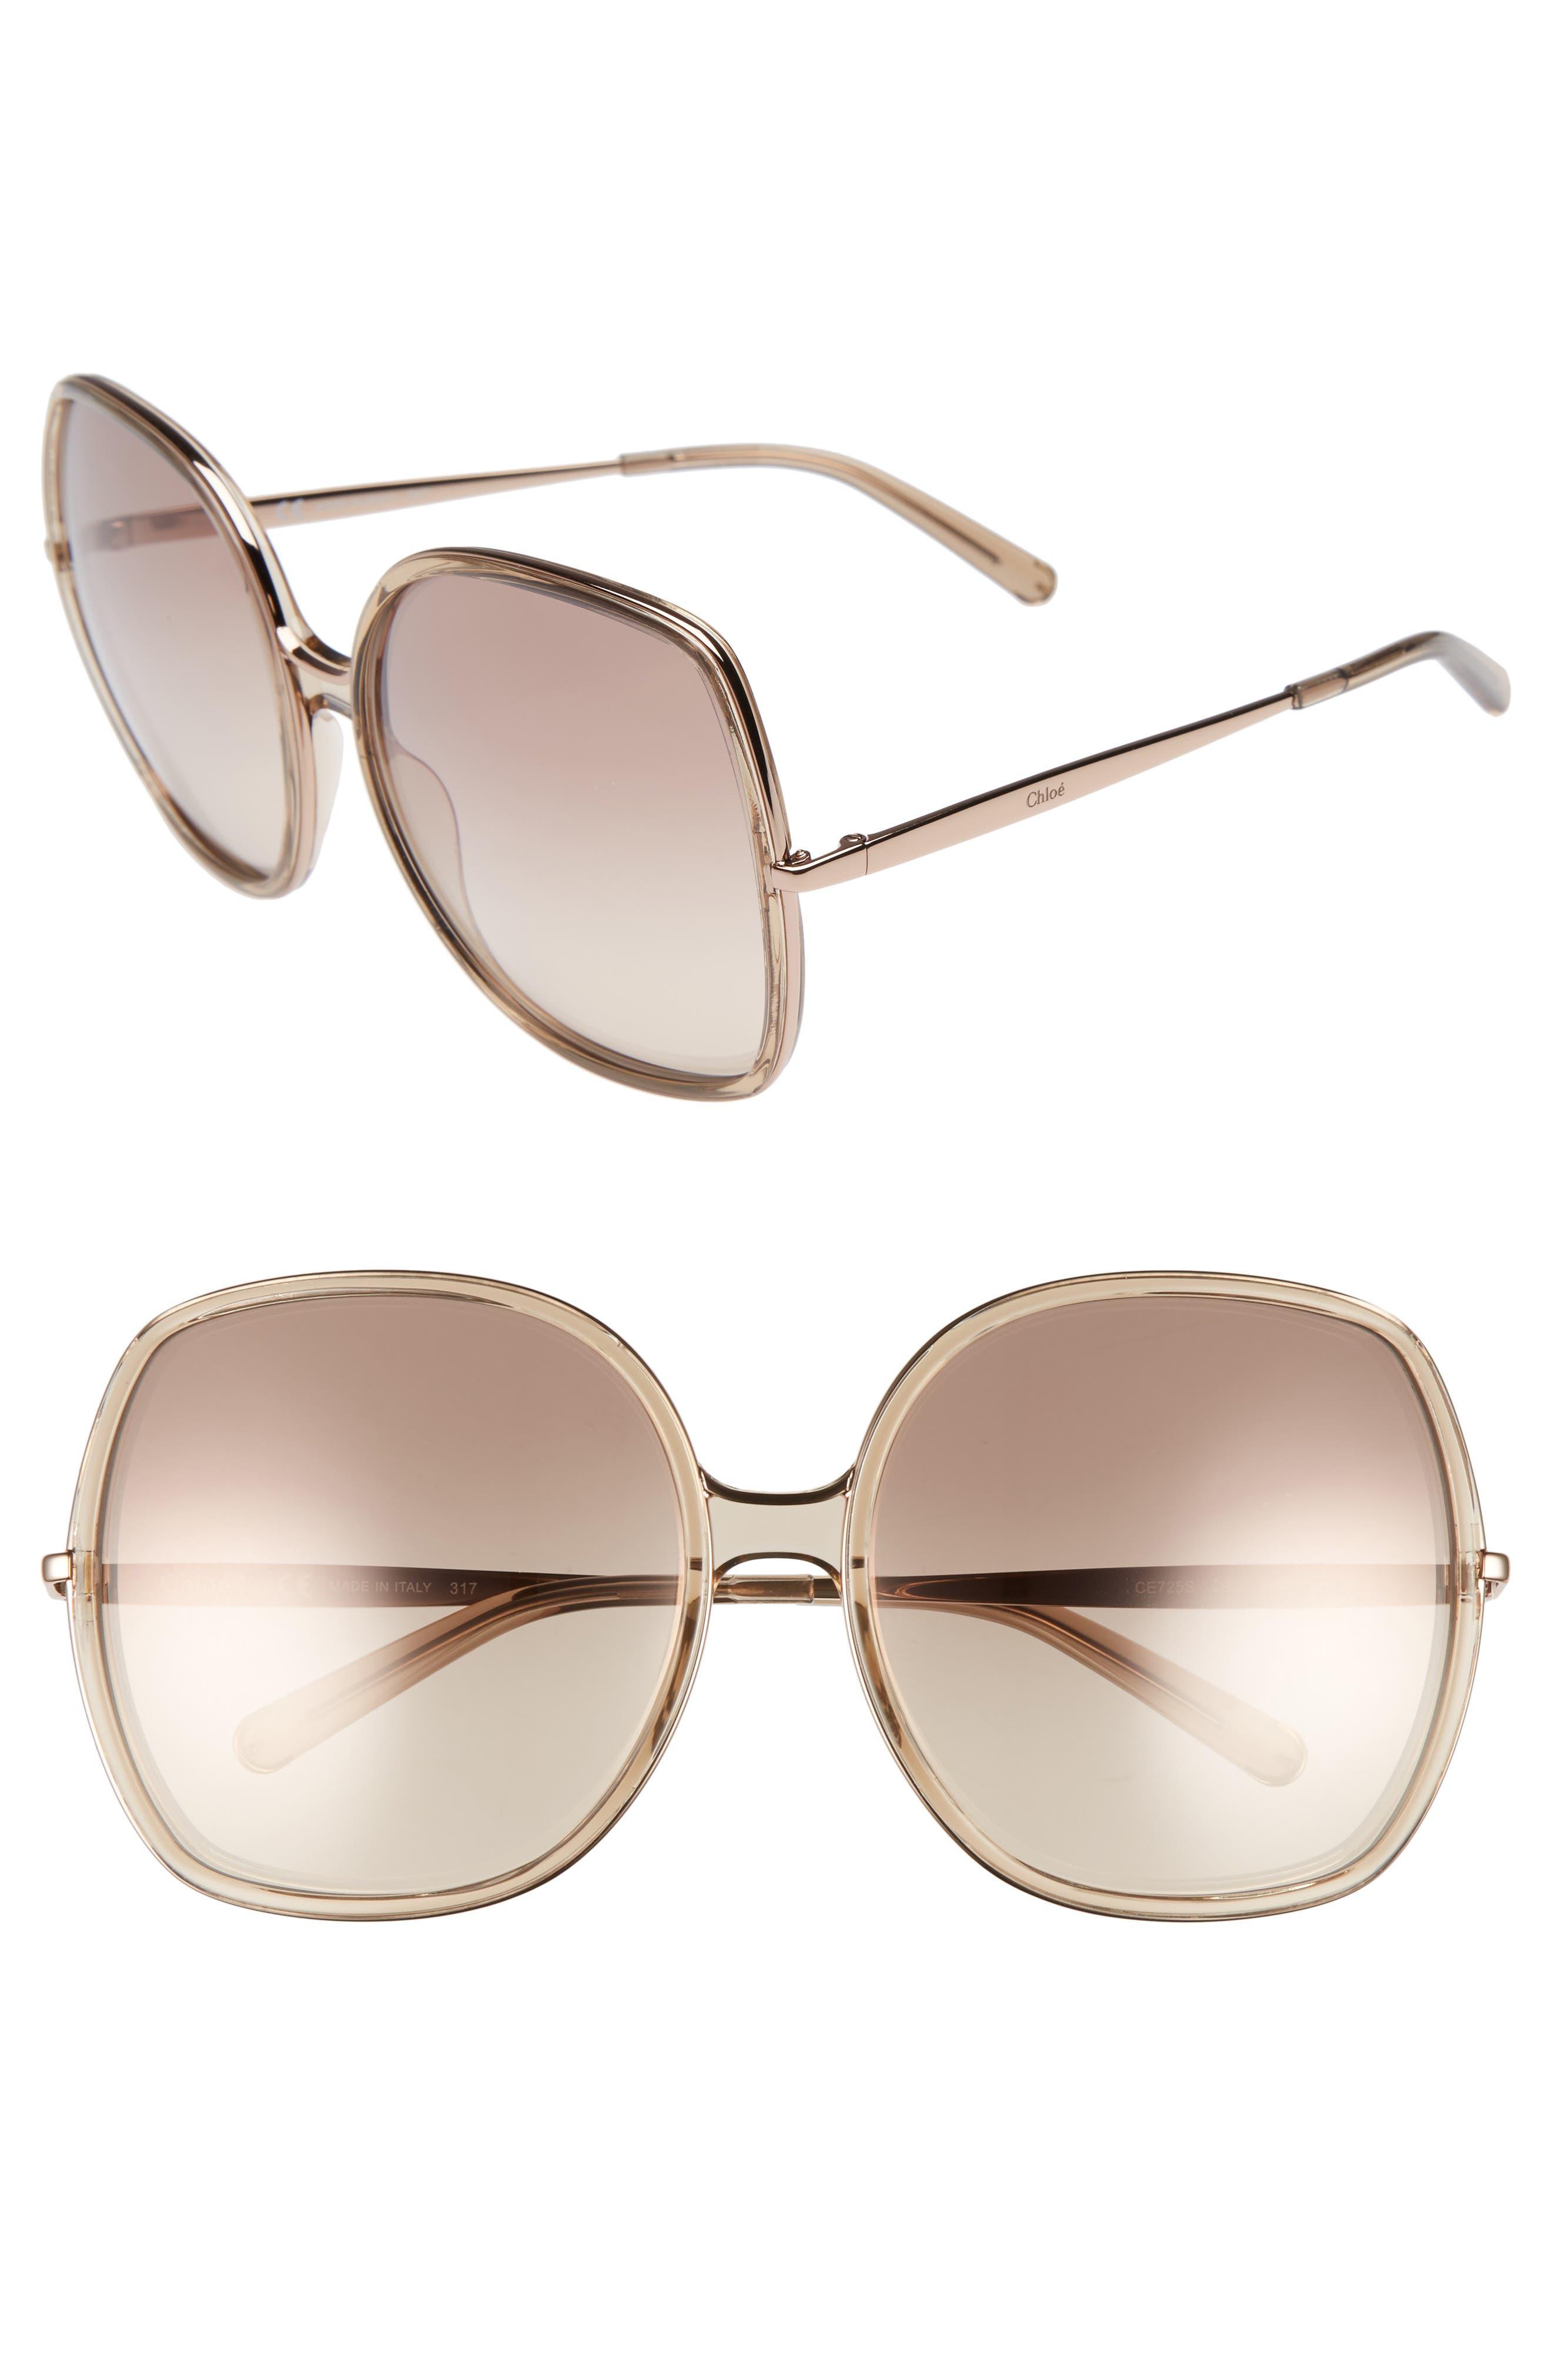 62mm Oversized Gradient Lens Square Sunglasses,                             Main thumbnail 1, color,                             Nude